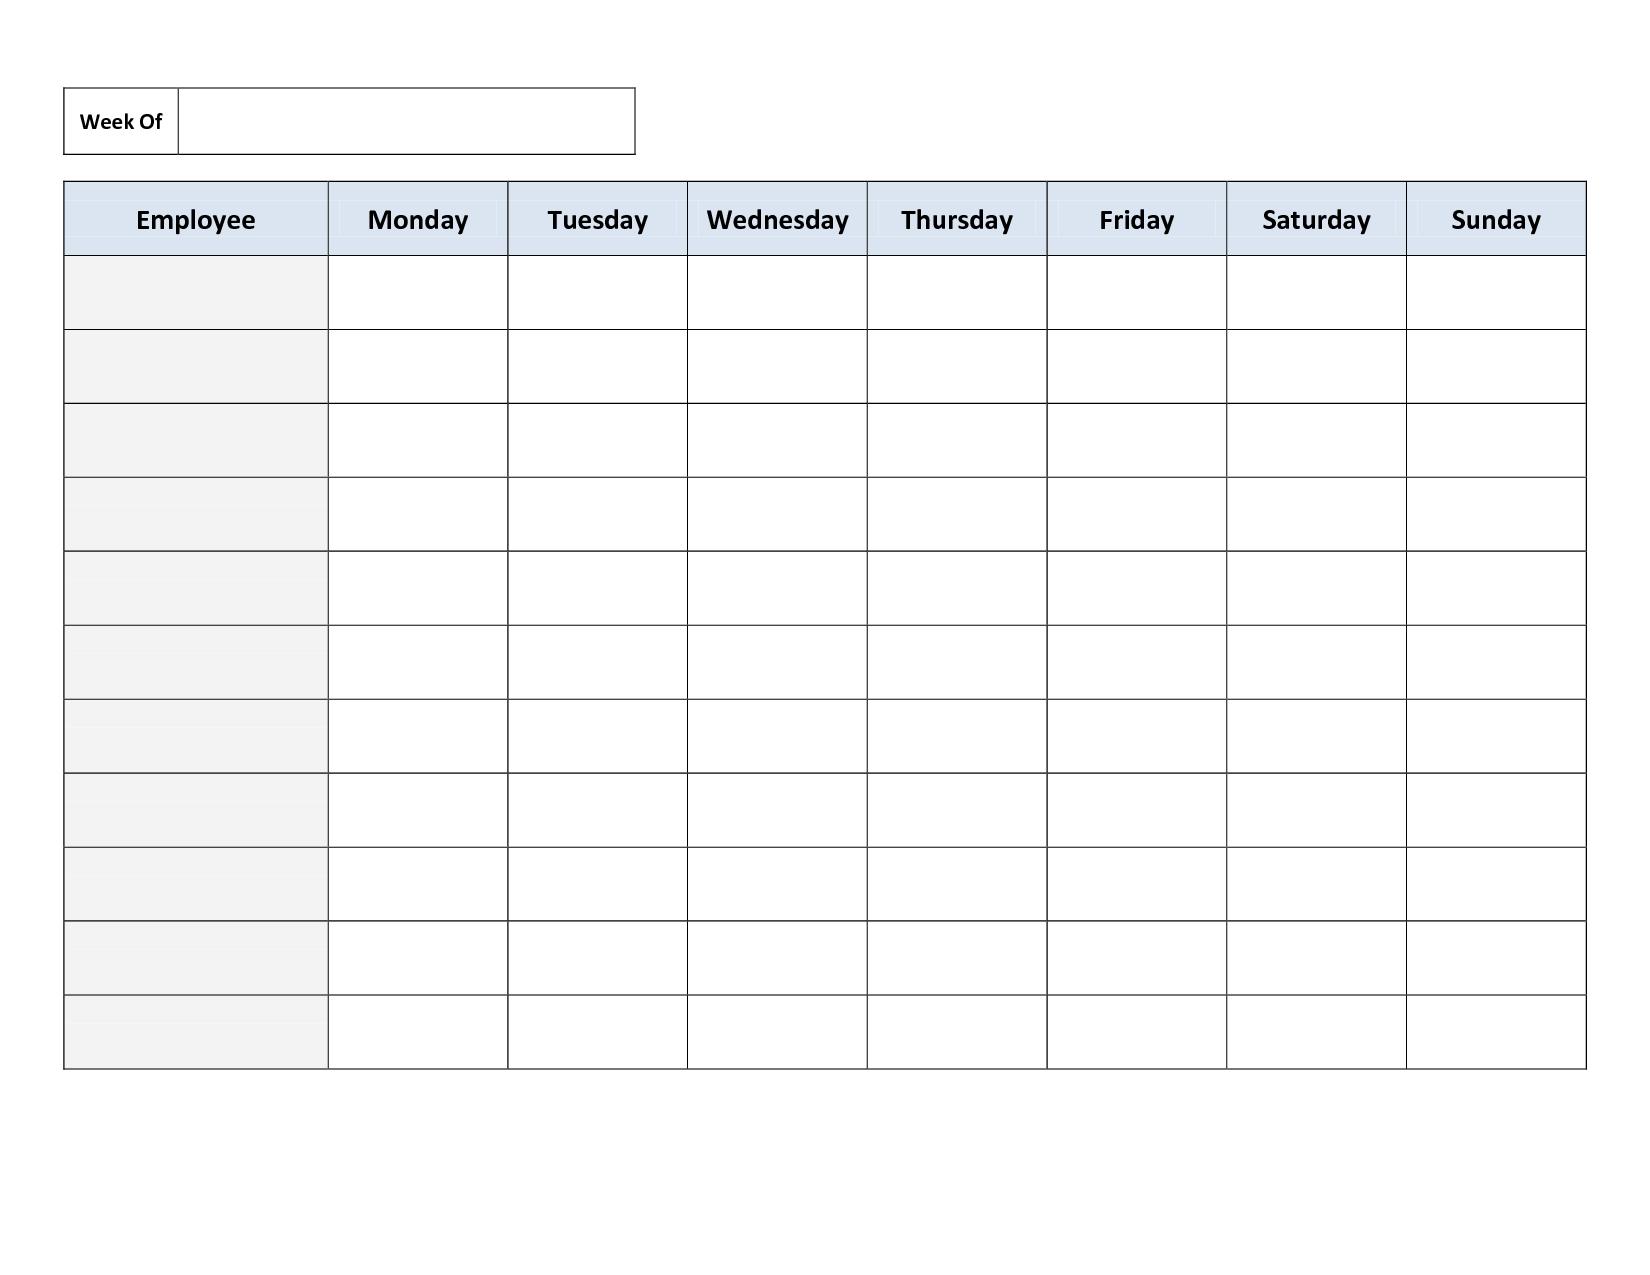 Blank Weekly Work Schedule Template | Schedule | Cleaning Schedule - Free Printable Blank Work Schedules